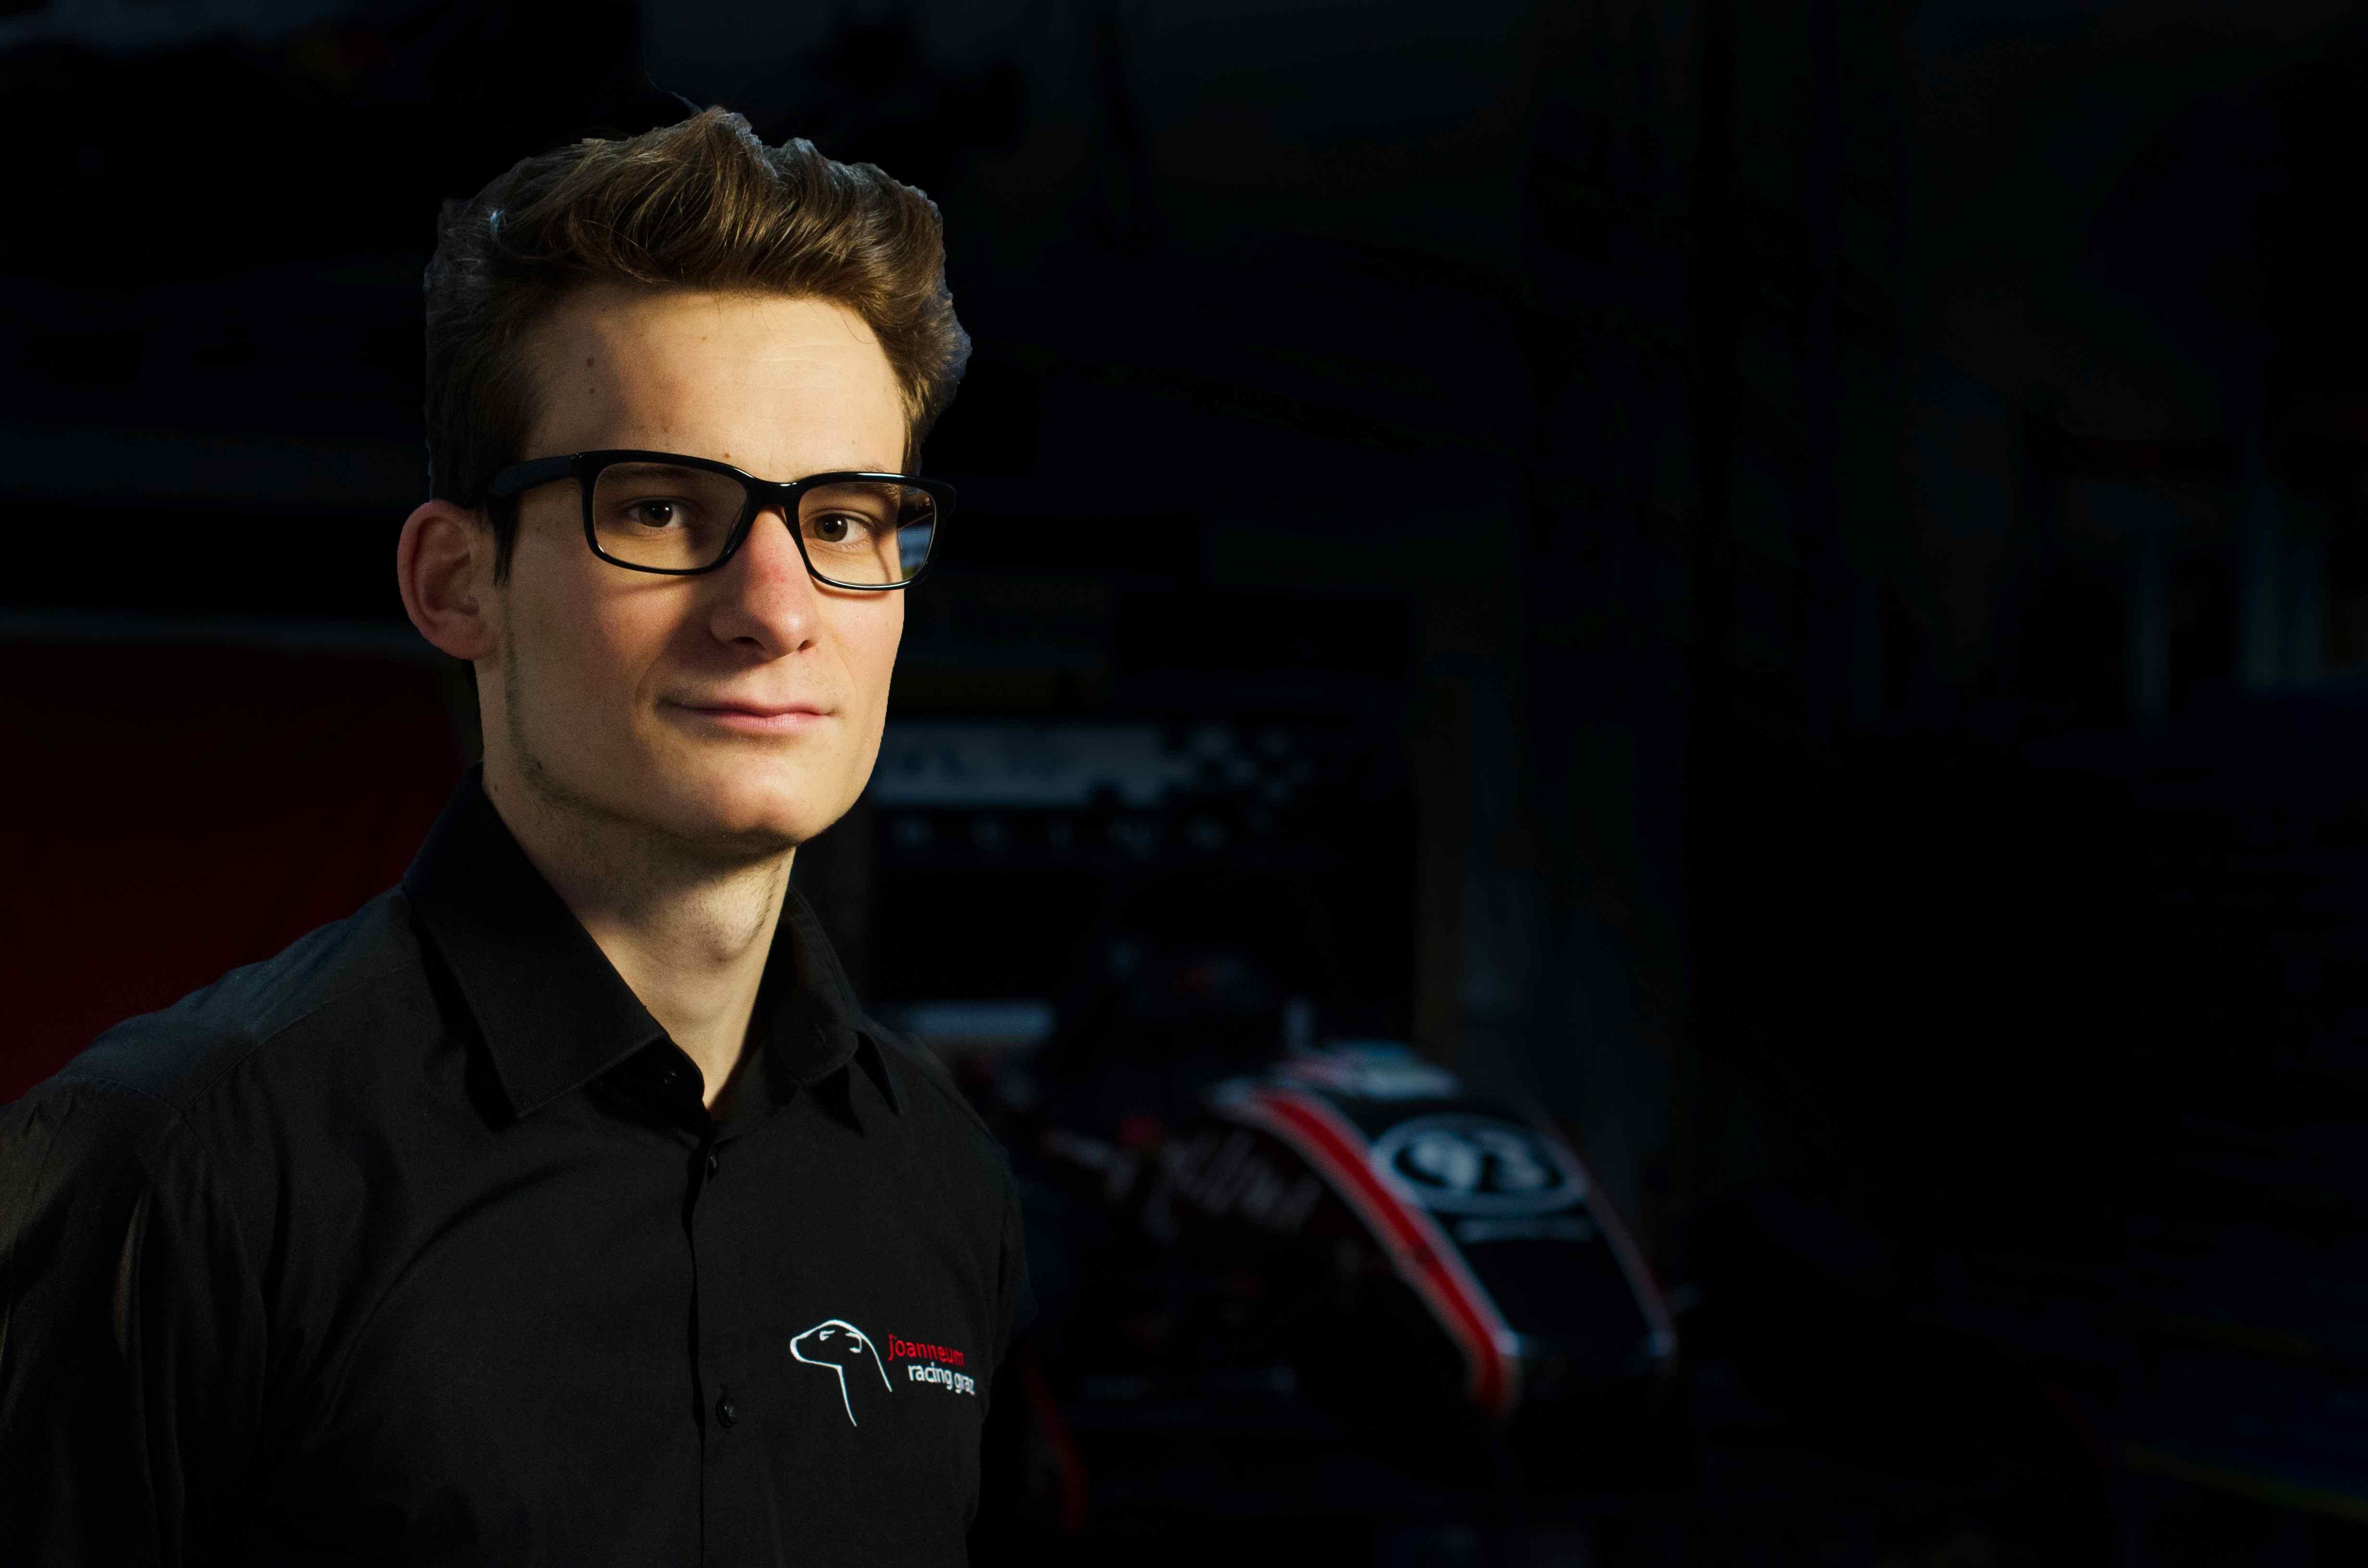 Florian Korak